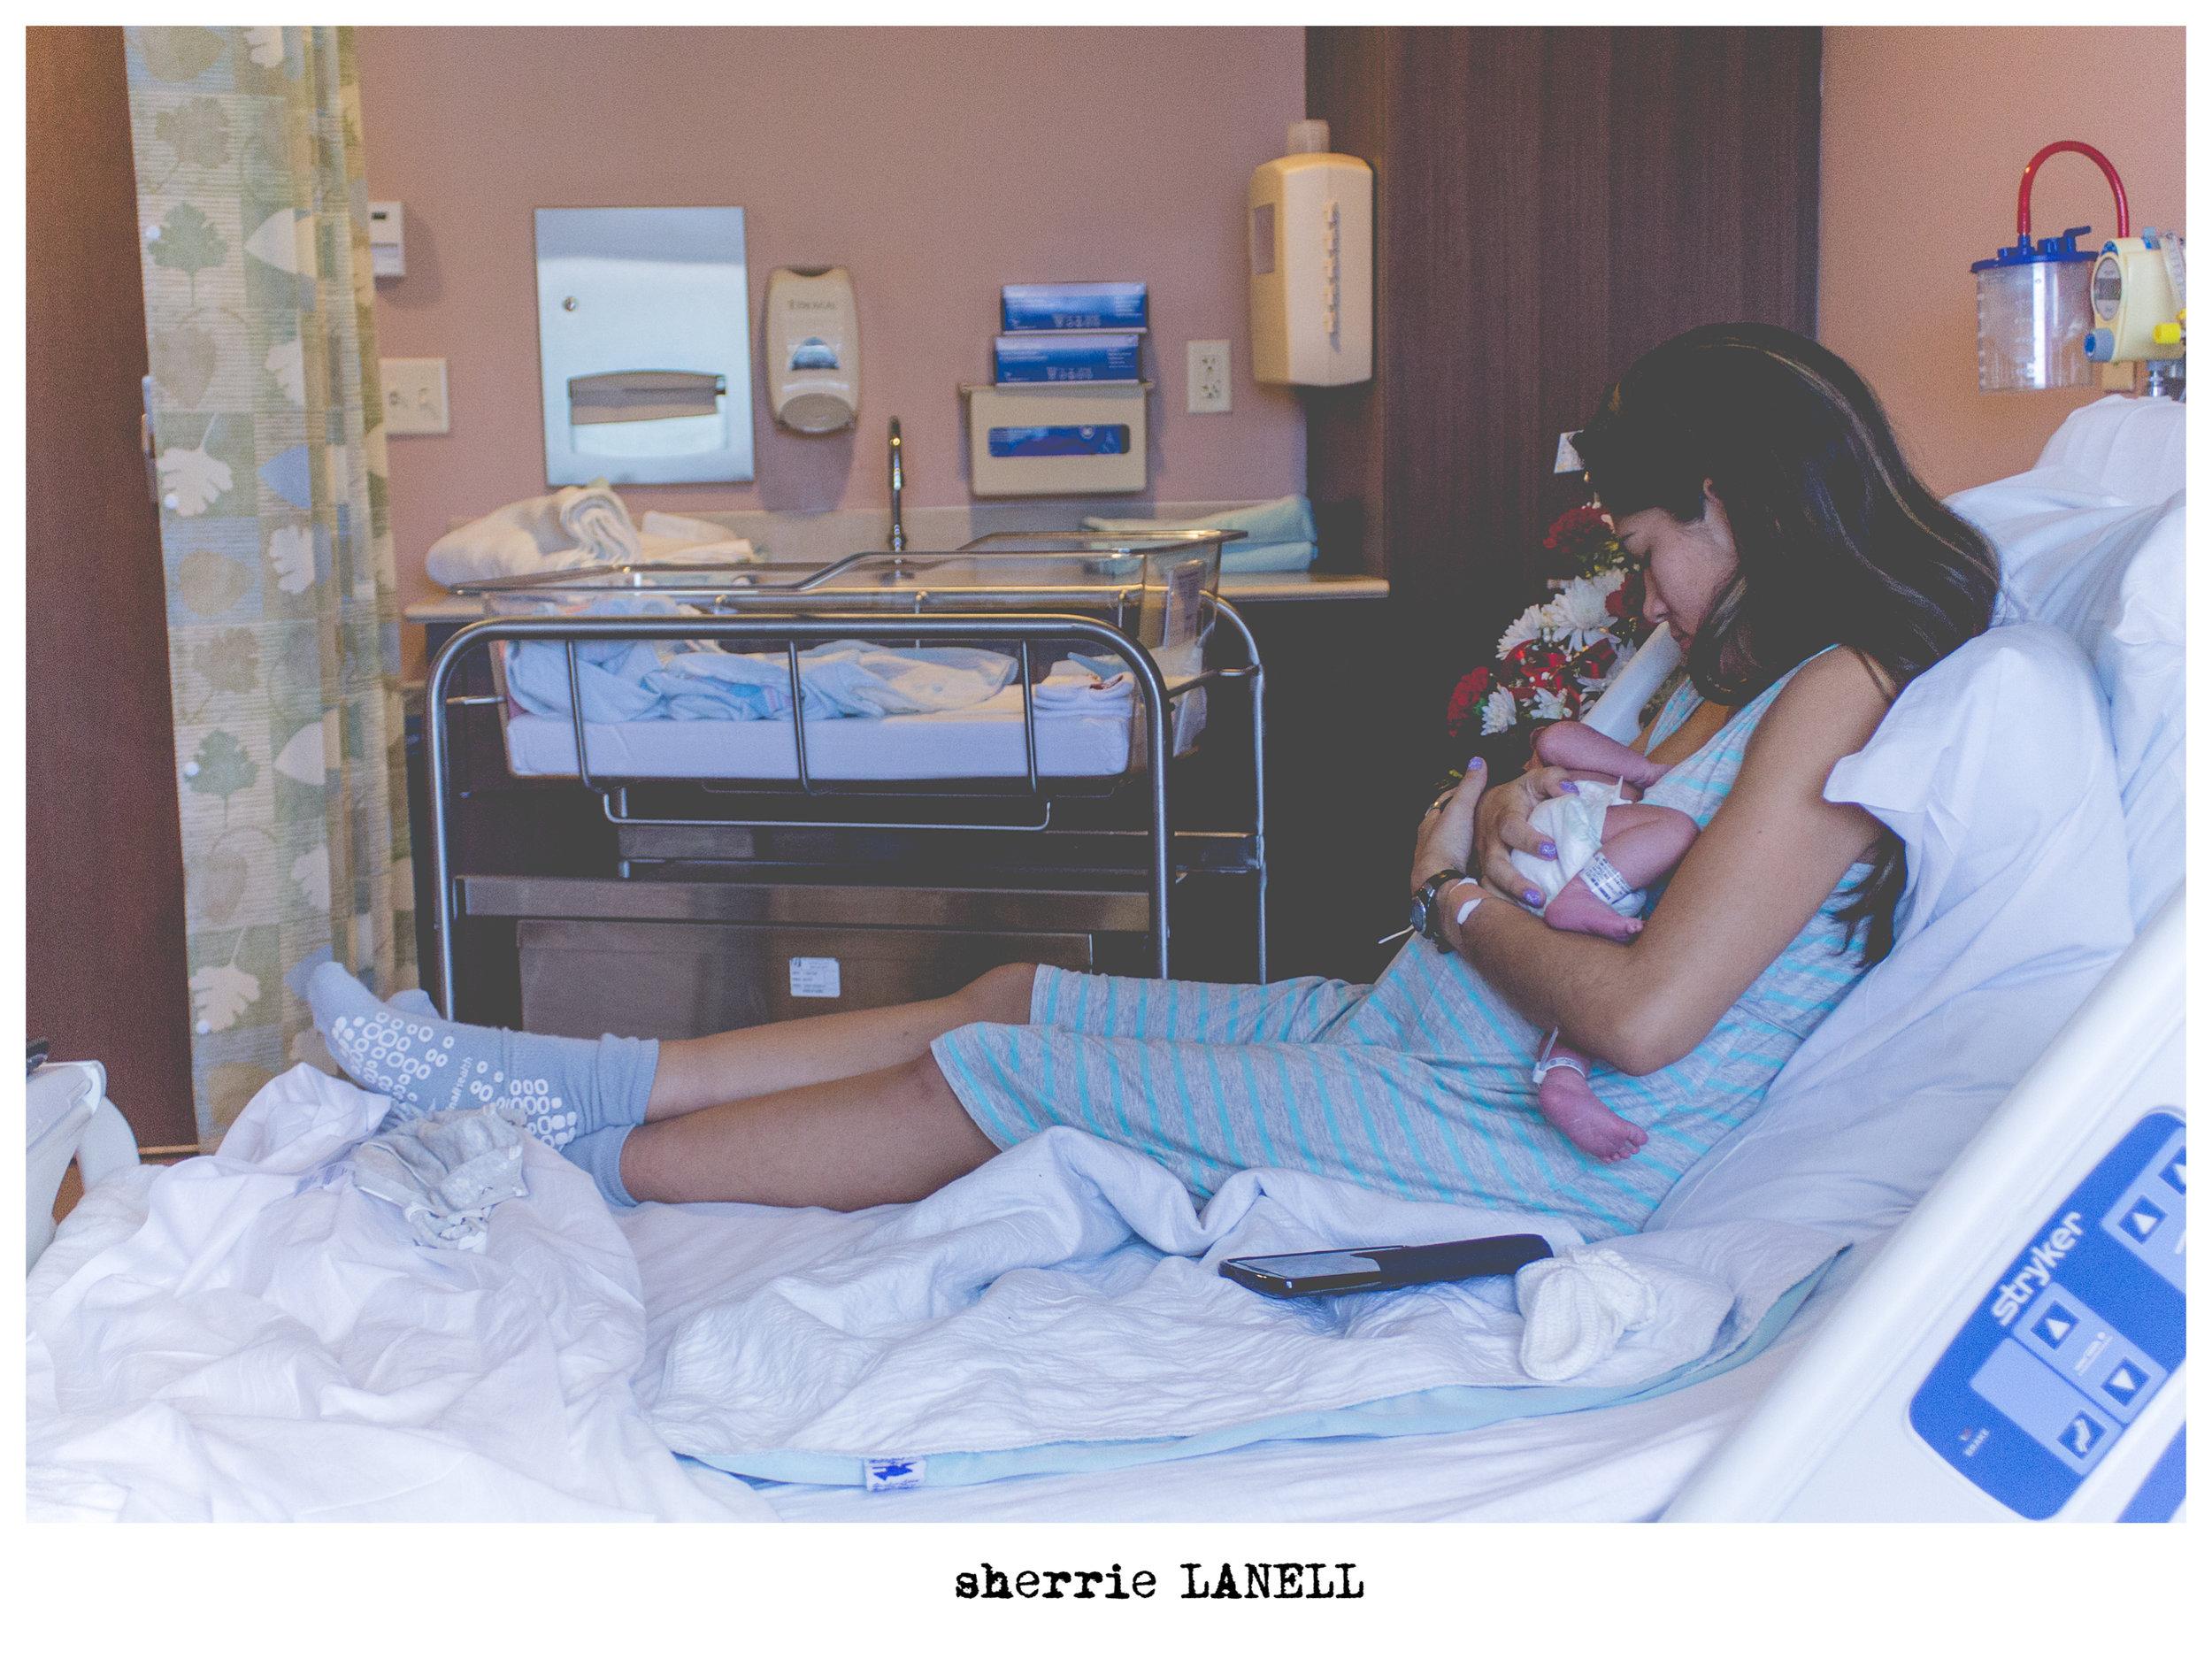 Sherrie Lanell - New Jersey Documentary Newborn Photographer 2.jpg